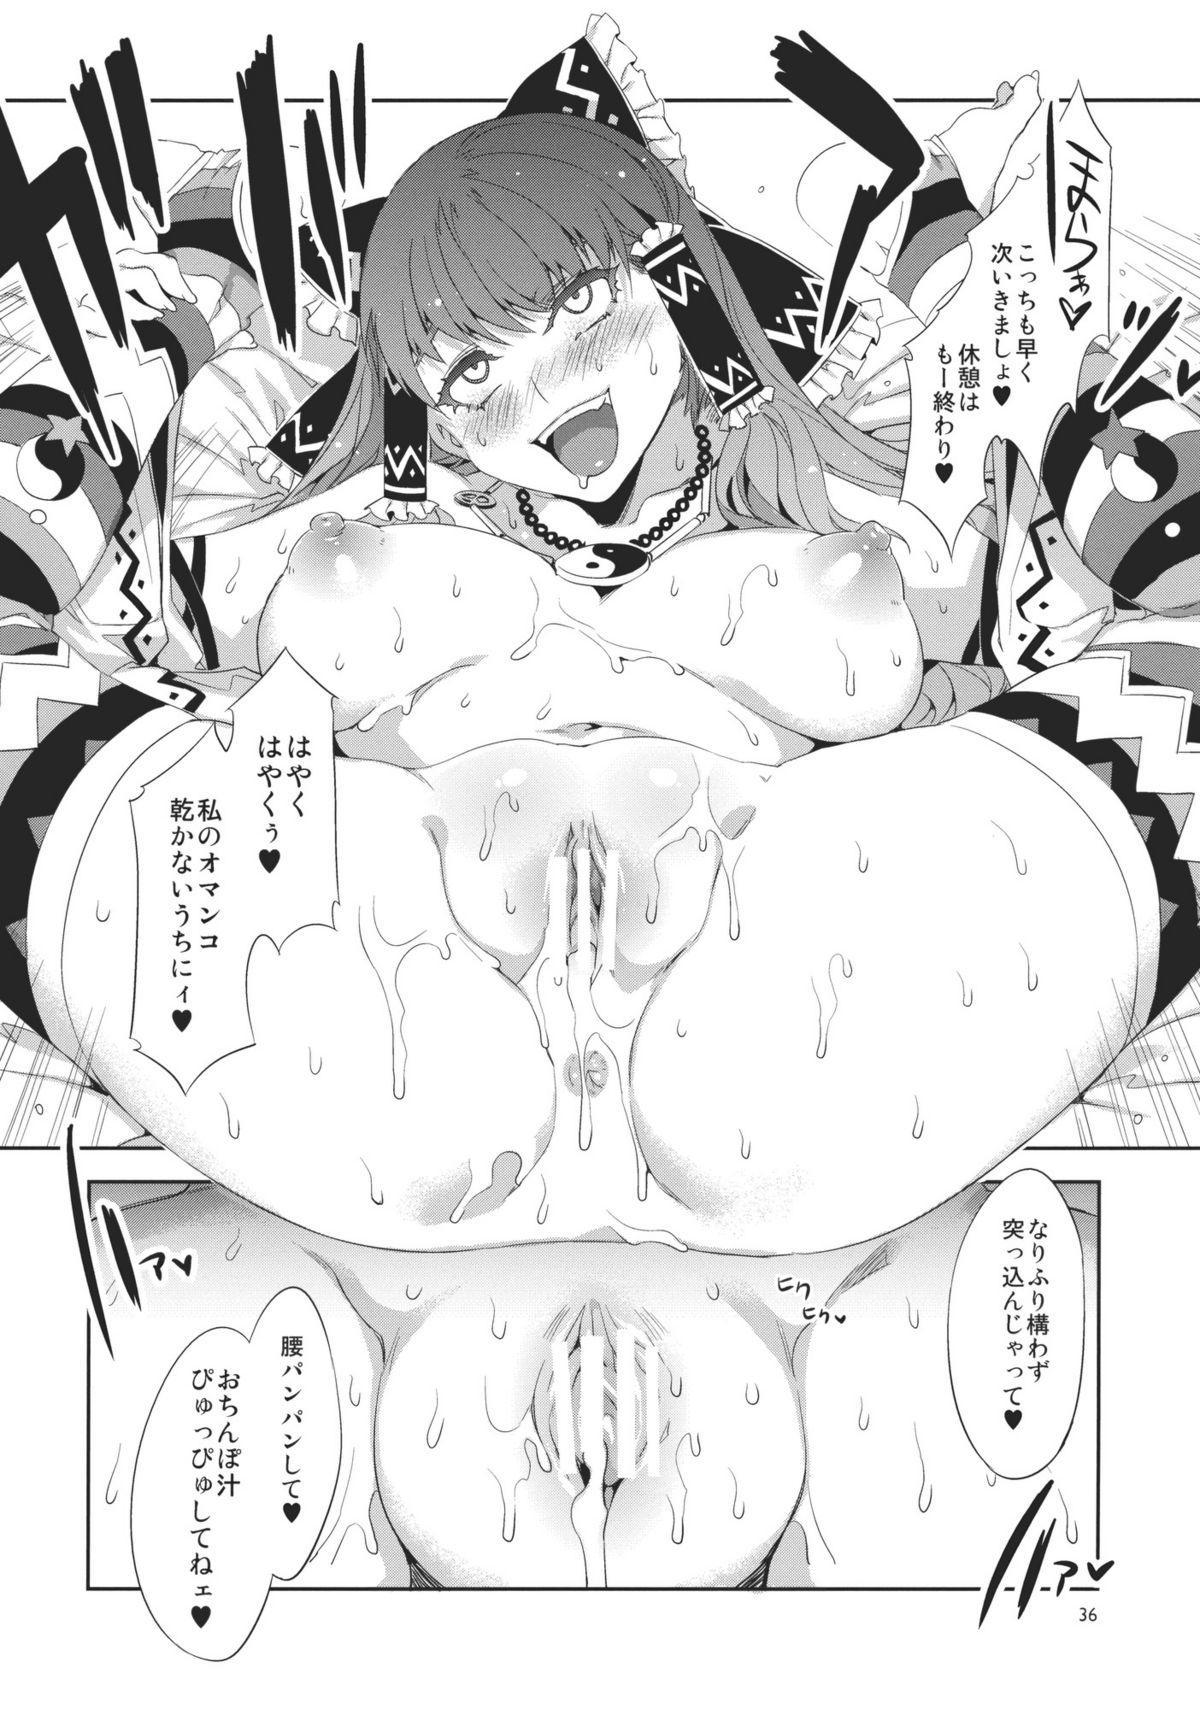 Touhou Gensou Houkai 35